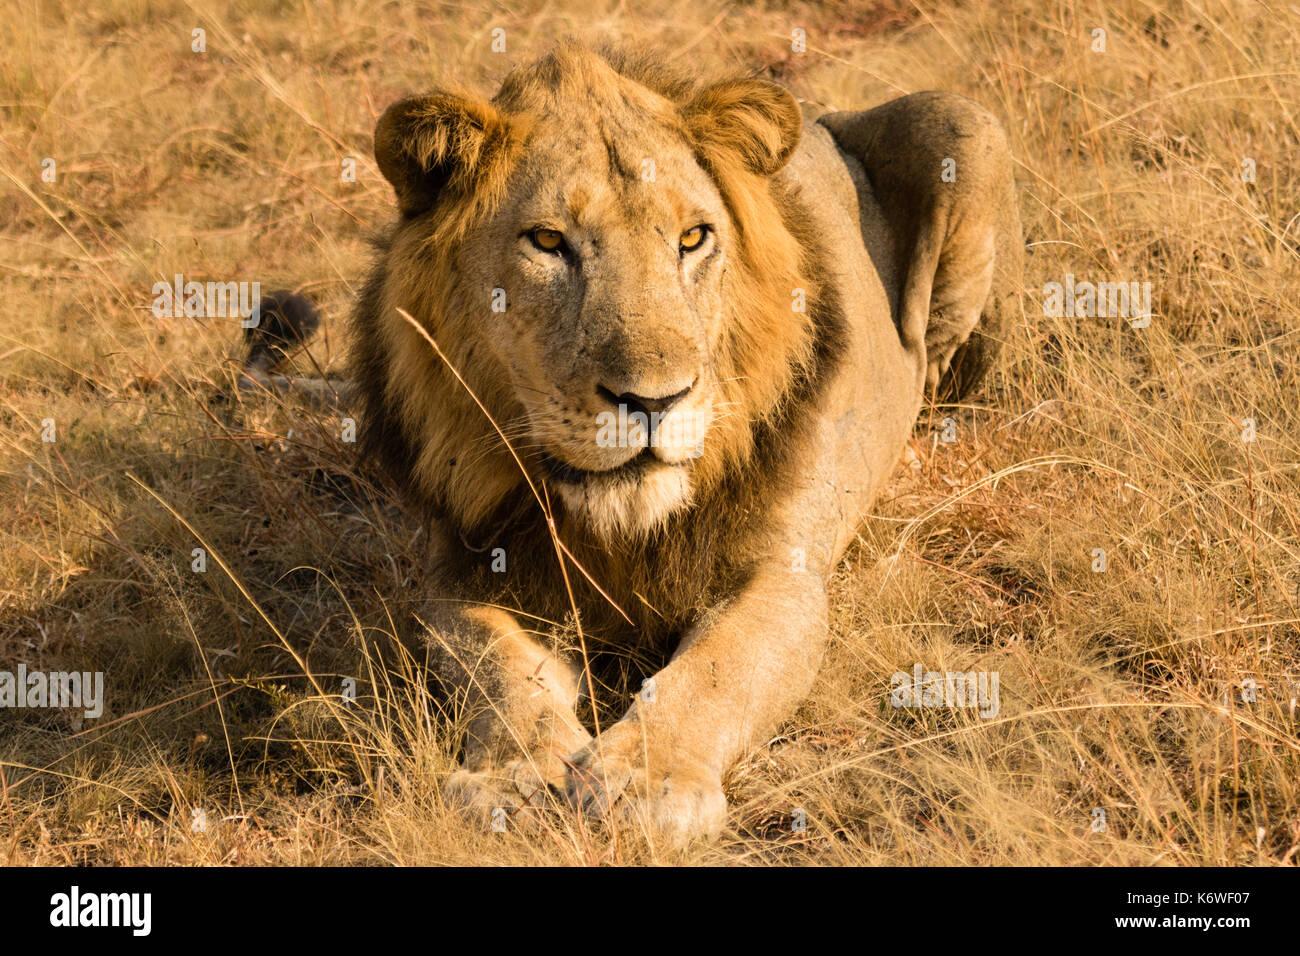 Lion (panthera leo), giacente in erba secca, Queen Elisabeth national park, UGANDA Immagini Stock